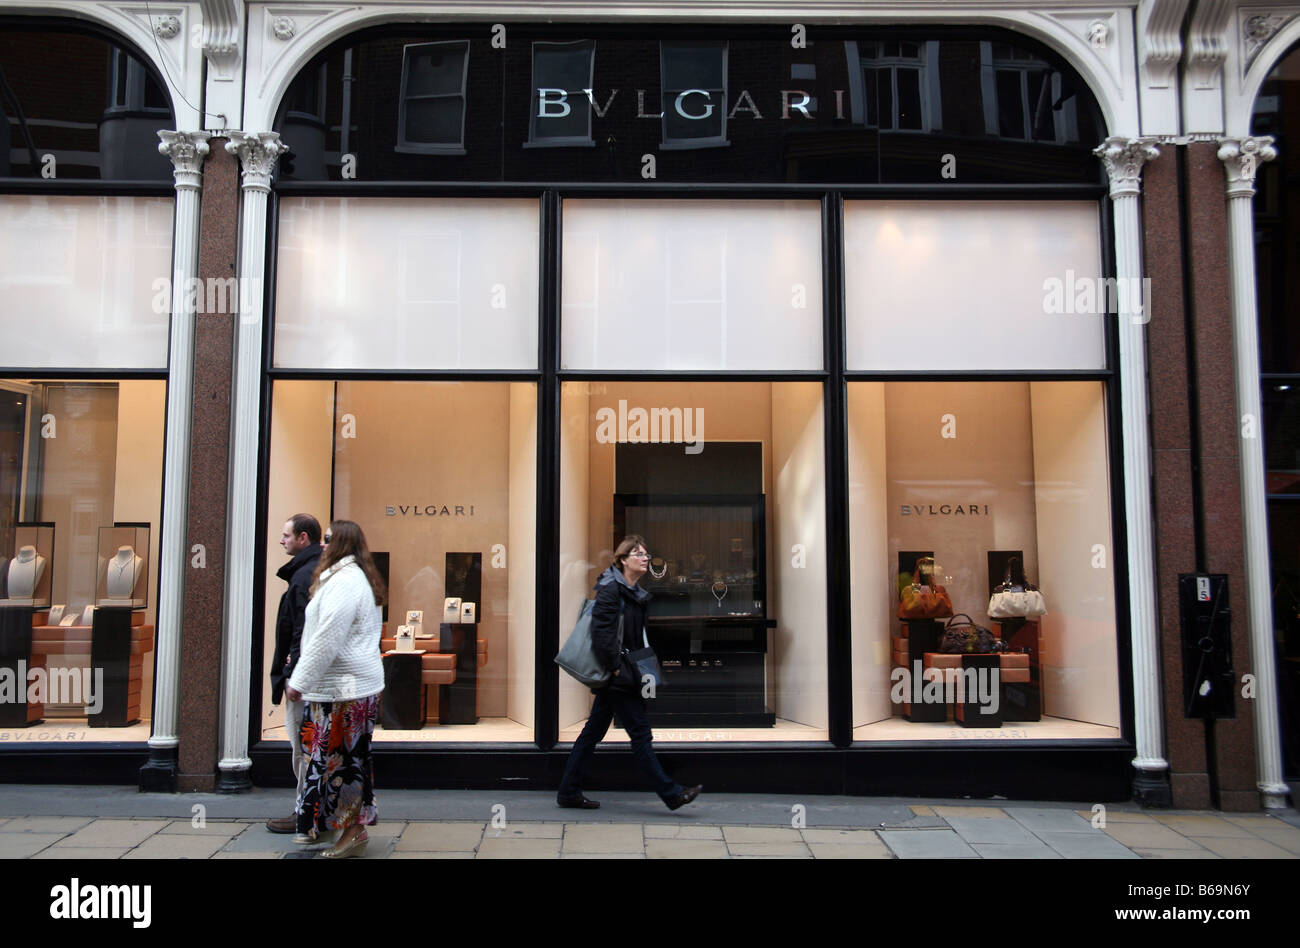 Bulgari a Londra datazione Mobile dating HQ datazione ABO